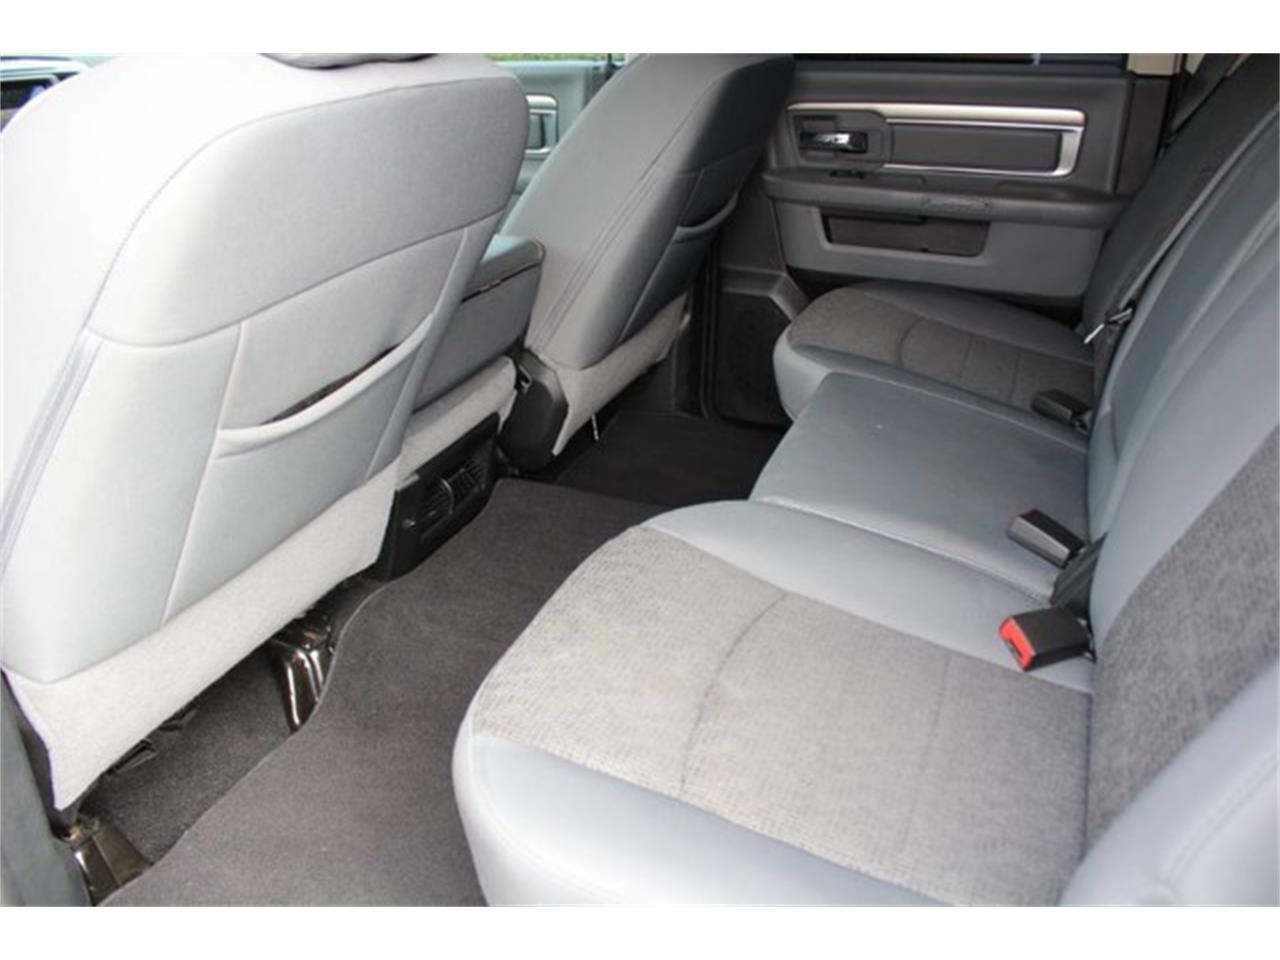 2017 Dodge Ram 1500 (CC-1416997) for sale in Anaheim, California